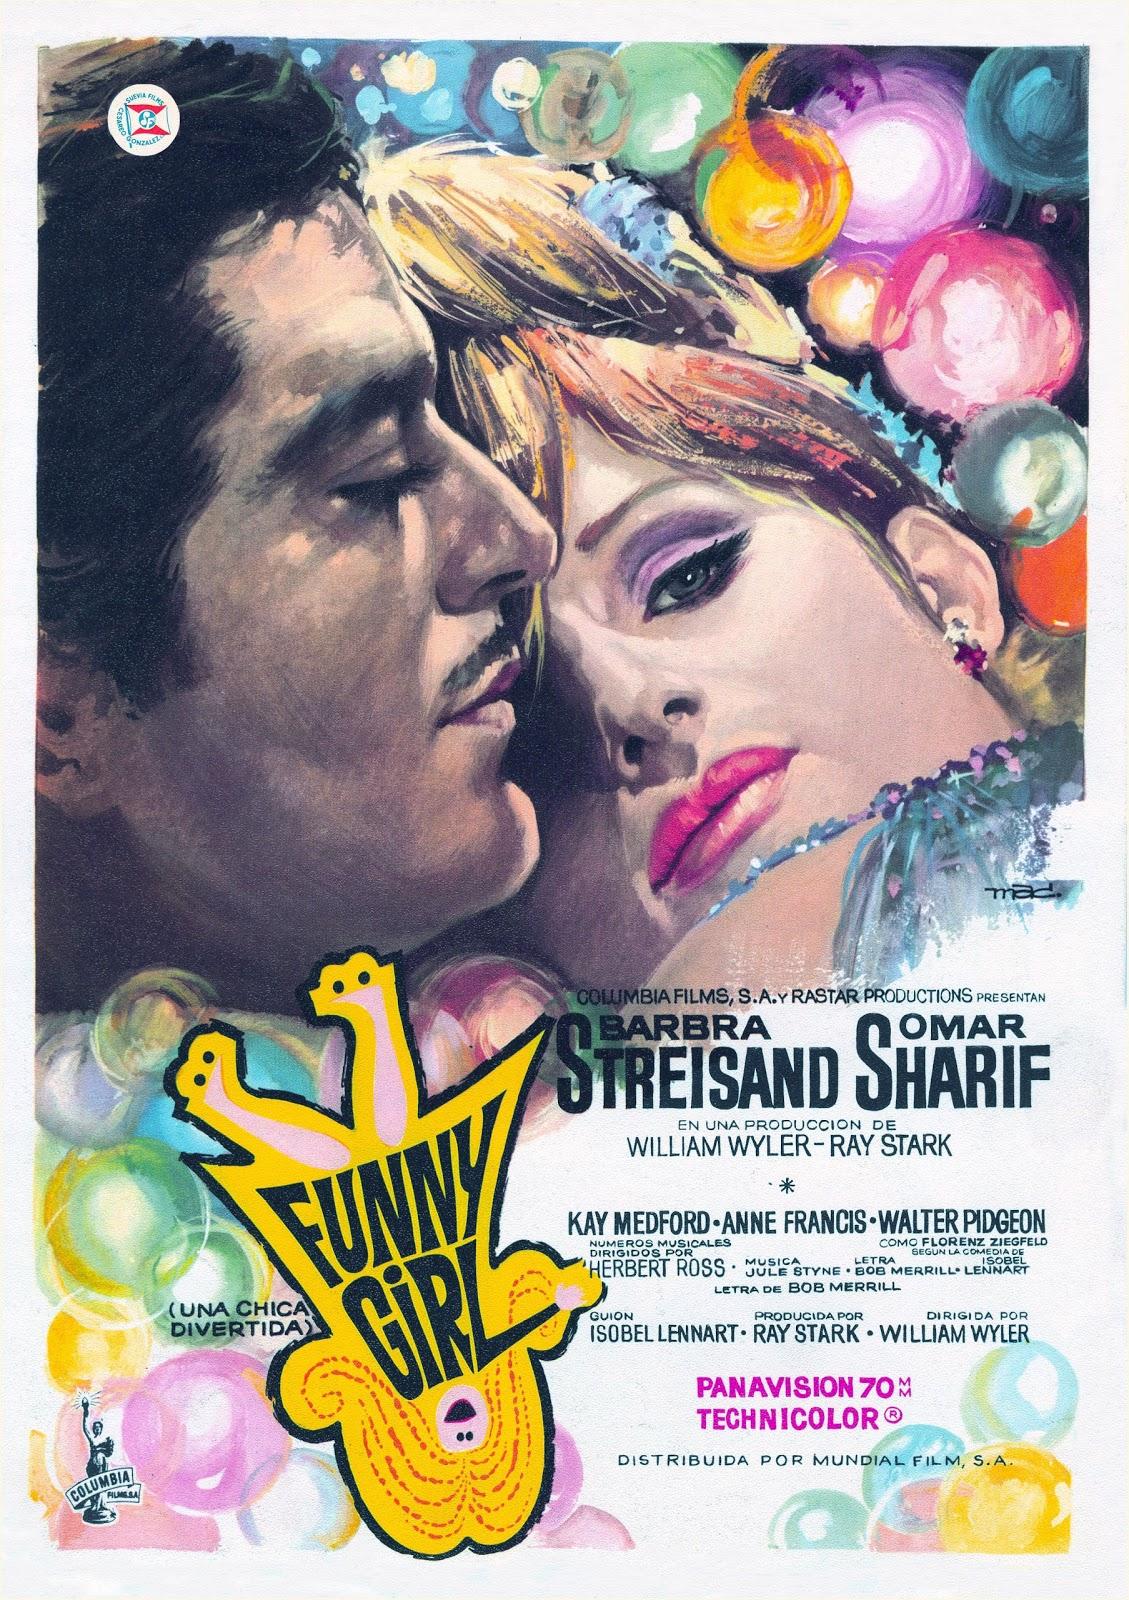 http://3.bp.blogspot.com/-1hE9wP6QfxQ/Txws7IF54BI/AAAAAAAAY7A/O_21LwB0ARI/s1600/BARBRA+STREISAND+film+1968.jpg